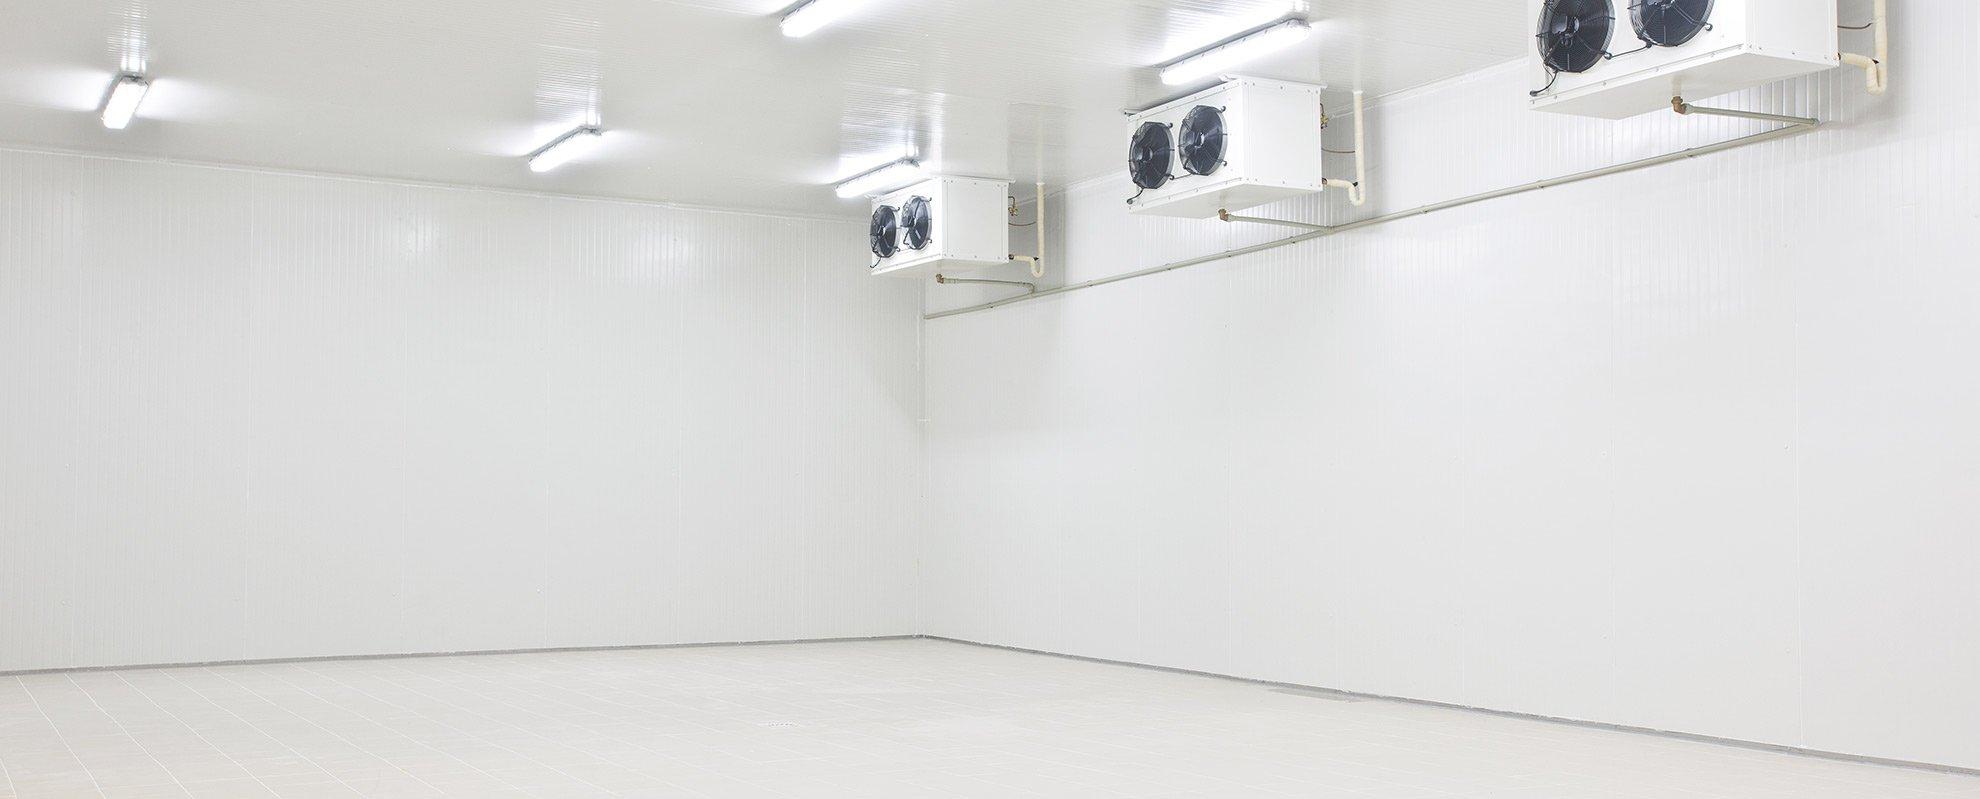 split n stawell heating and colling refrigeration repair